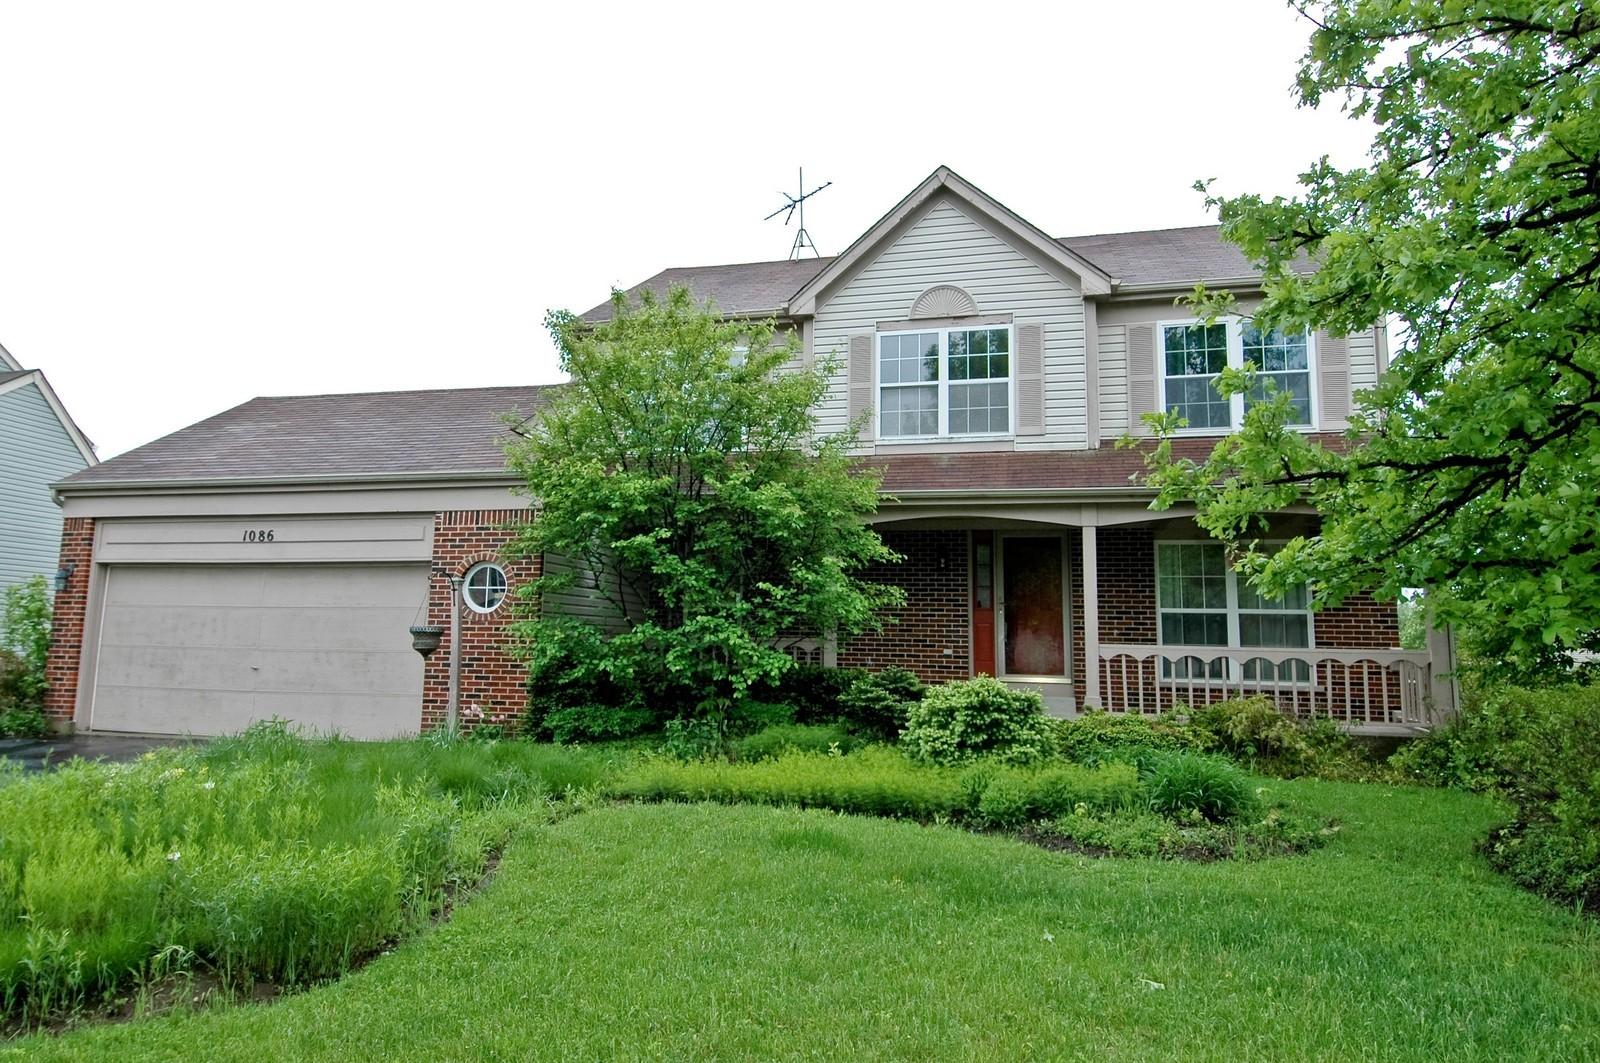 Real Estate Photography - 1086 Camillia, Fox River Grove, IL, 60021 - Front View